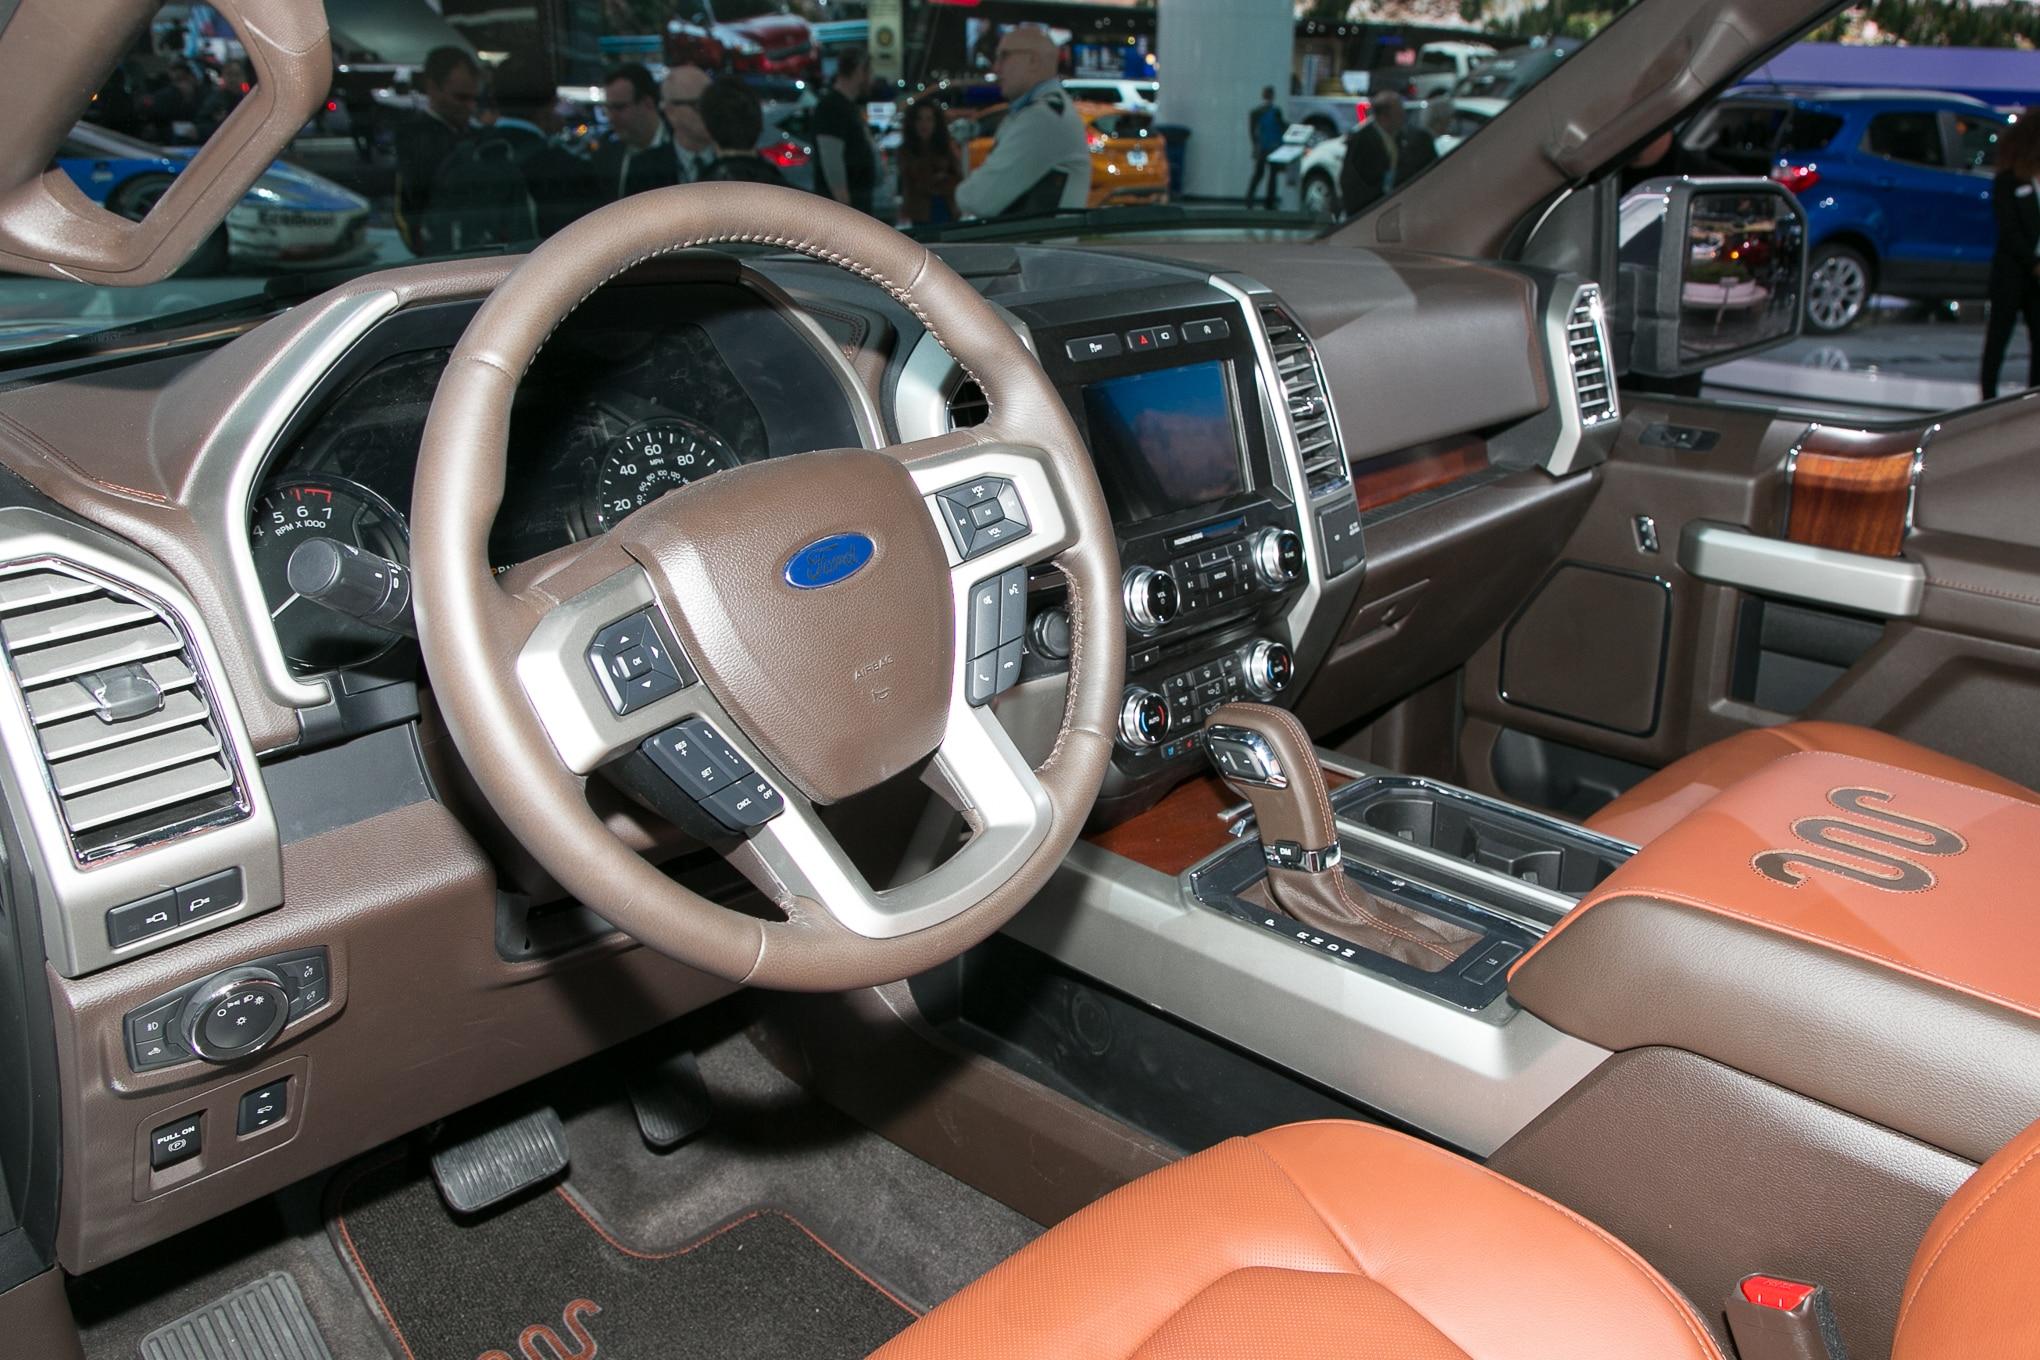 2018 Ford F 150 King Ranch Interior 10 Enero 2017 Carol Ngo